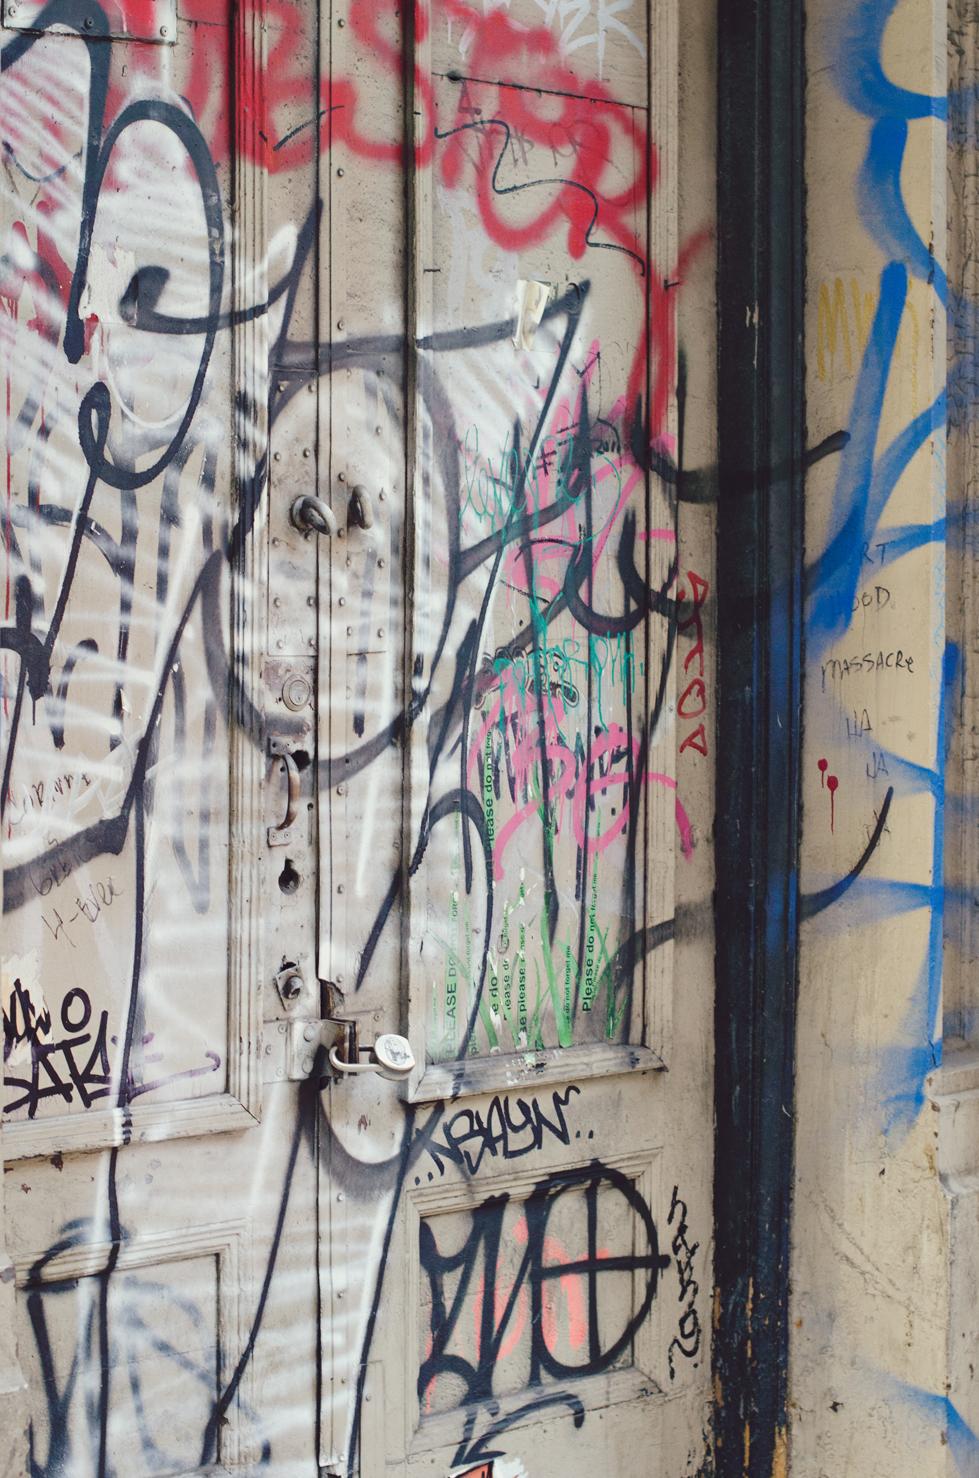 nyc20120621_0430.jpg